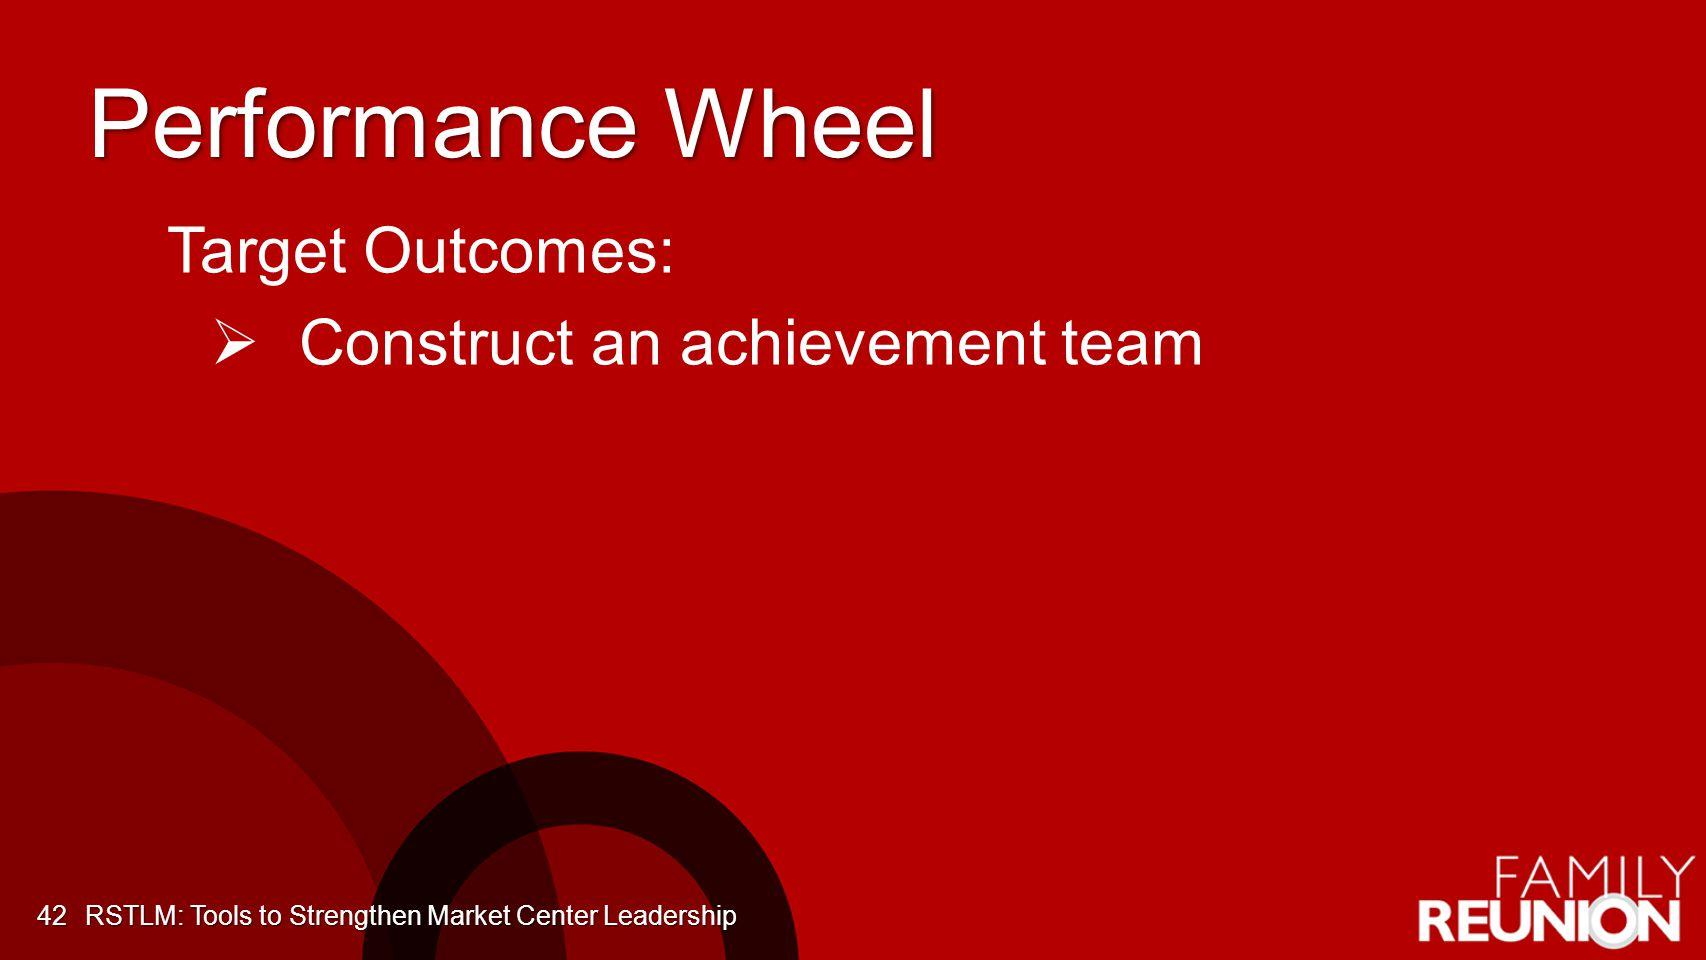 Performance Wheel Target Outcomes: Construct an achievement team